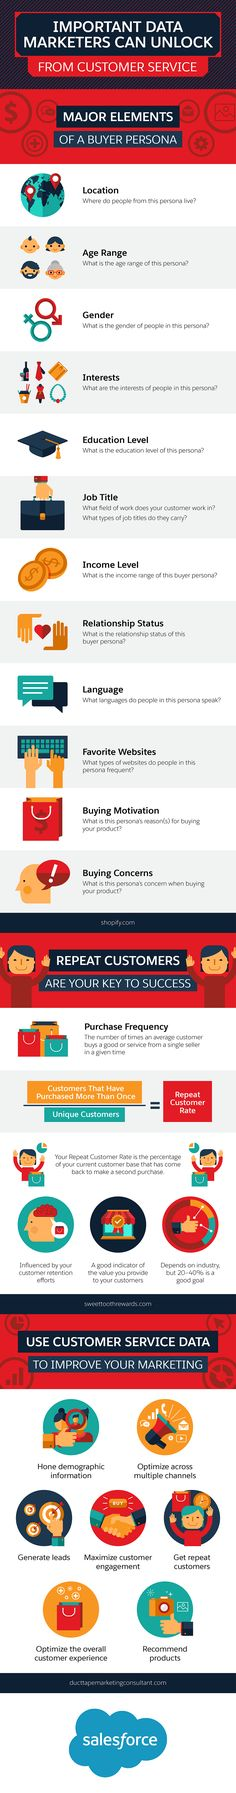 Elements of a Buyer Persona - Infographics - Website Magazine Social Media Analytics, Web Analytics, Social Media Marketing Business, Marketing Data, Inbound Marketing, Content Marketing, Marketing Strategies, Marketing Ideas, Marketing Digital